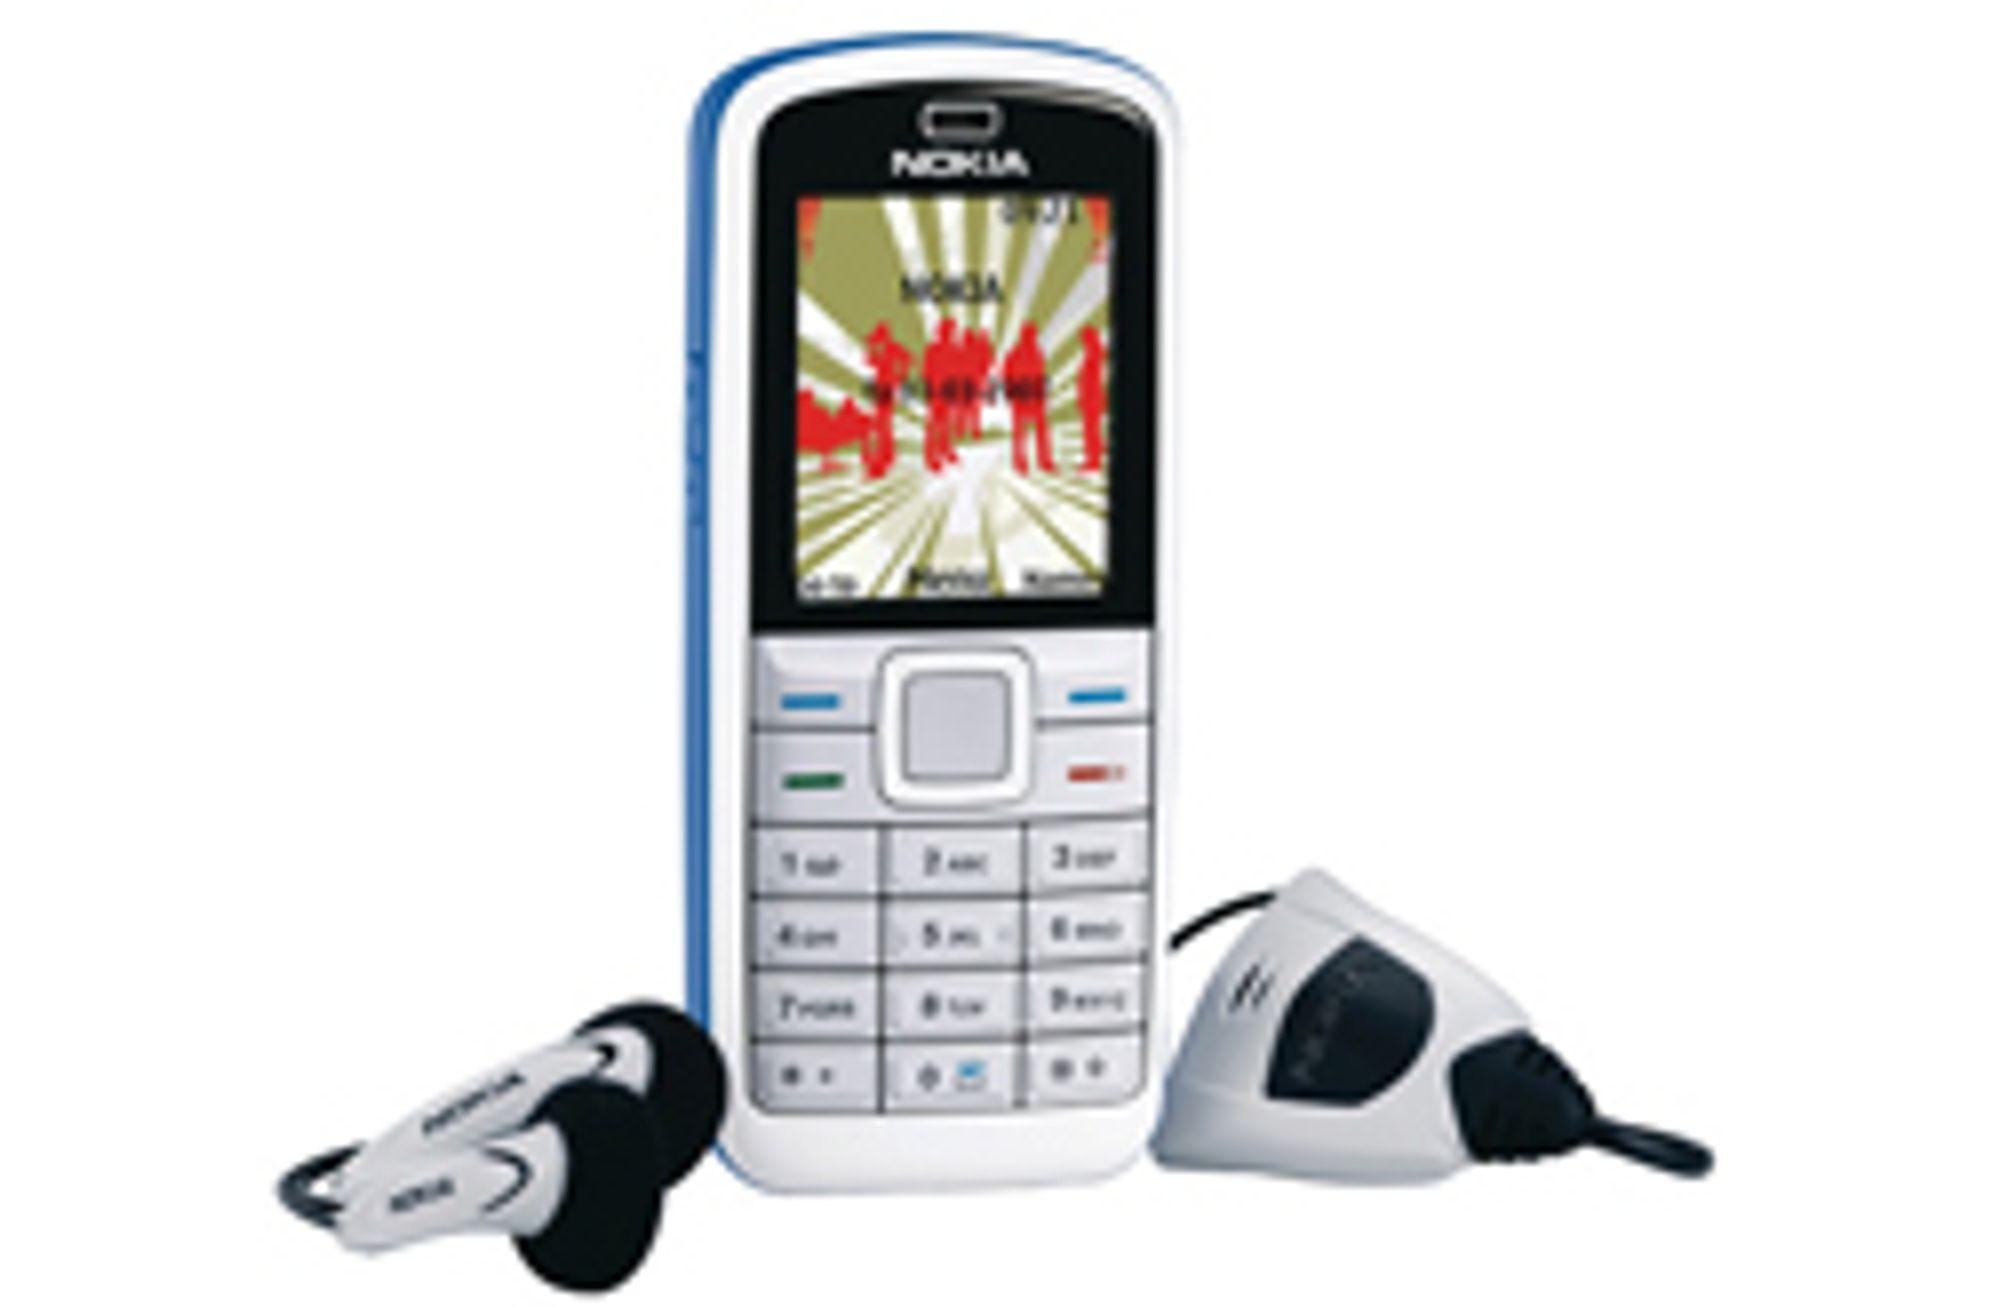 Nokia 5070 har radio og en lav pris.